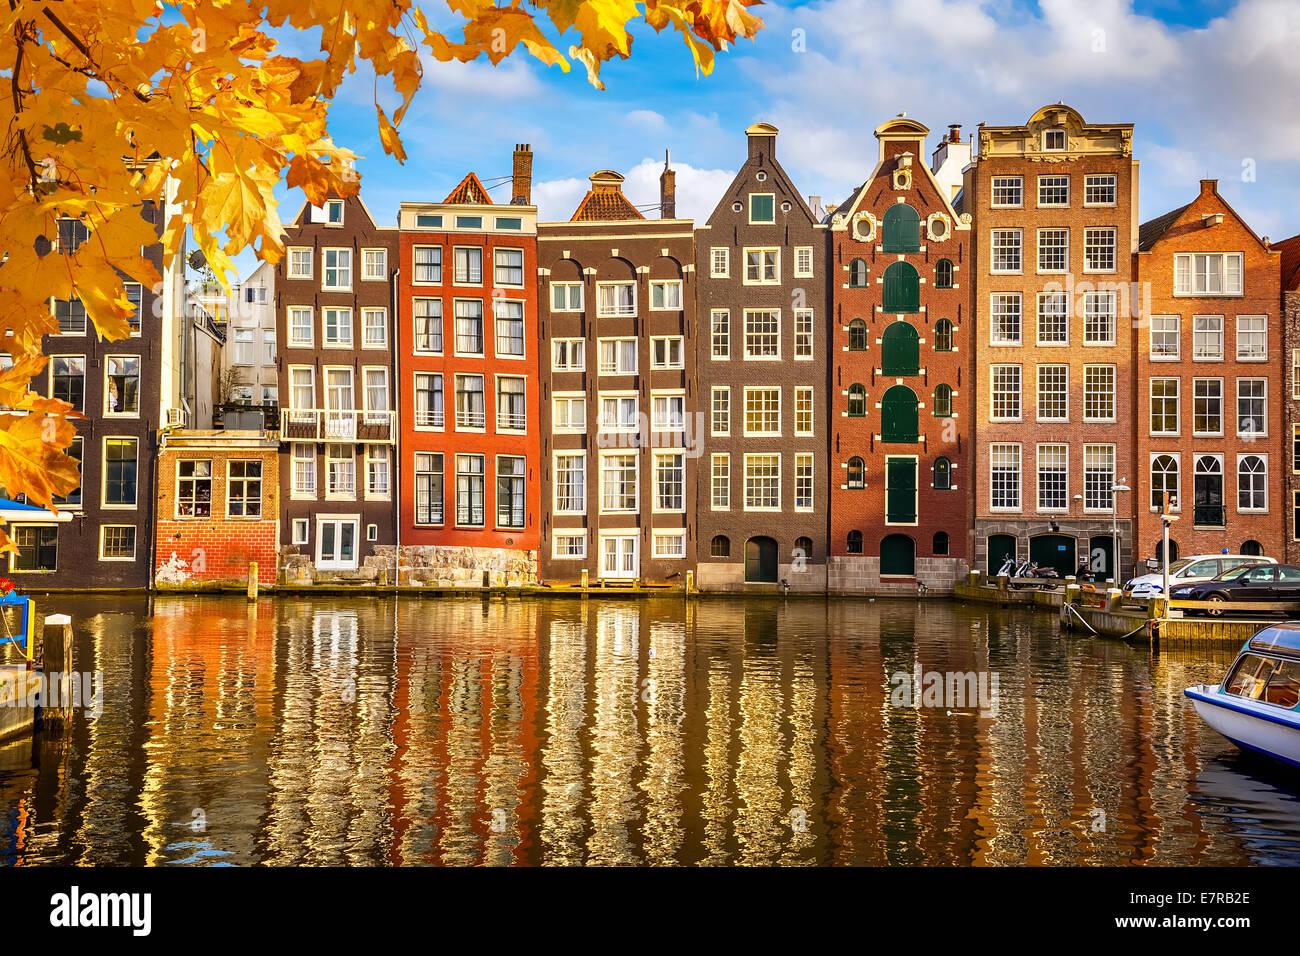 Edificios antiguos en Amsterdam Imagen De Stock